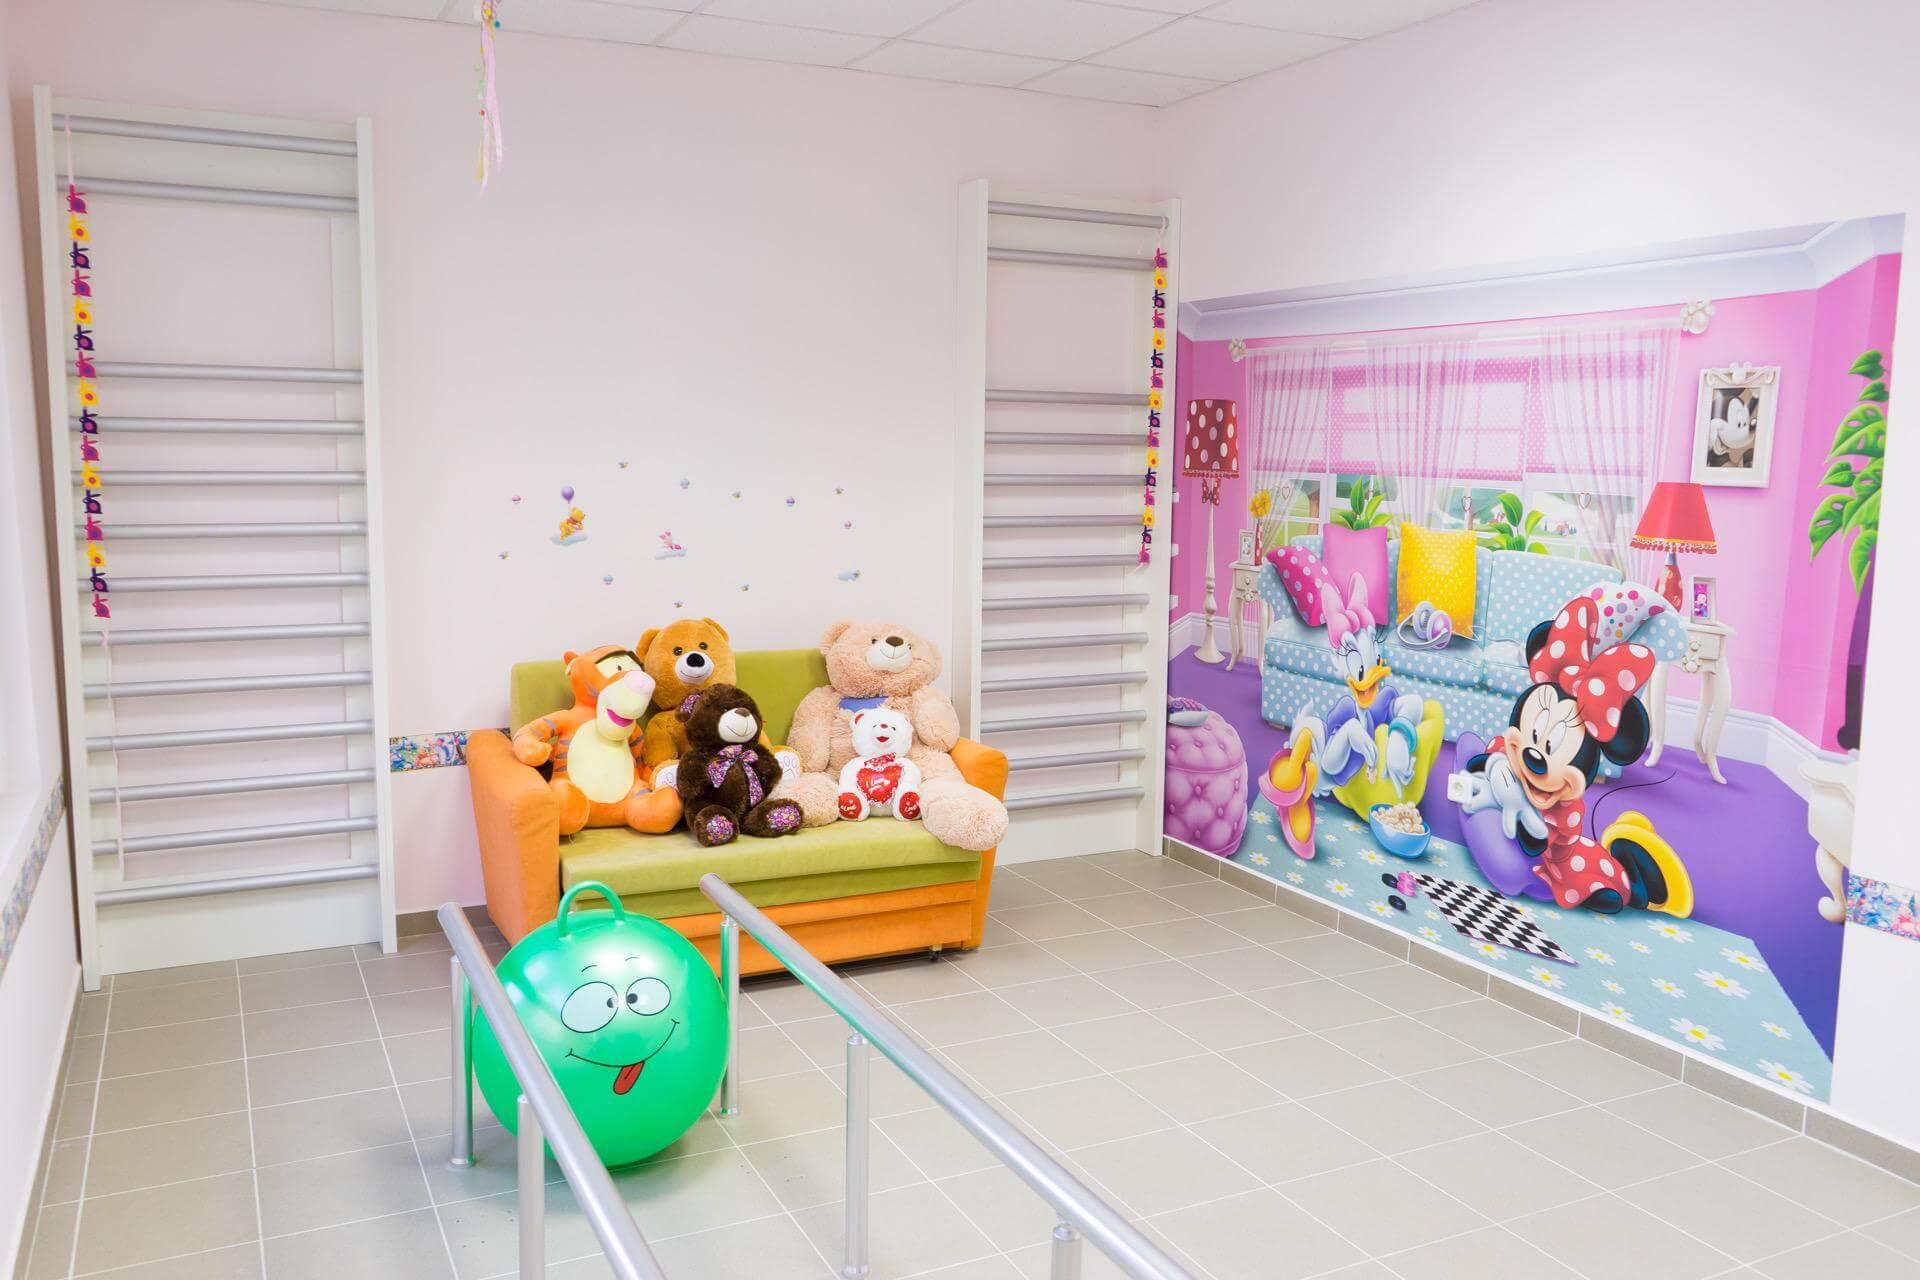 Протезиране на деца - детска рехабилитационна стая - Ортомедикс